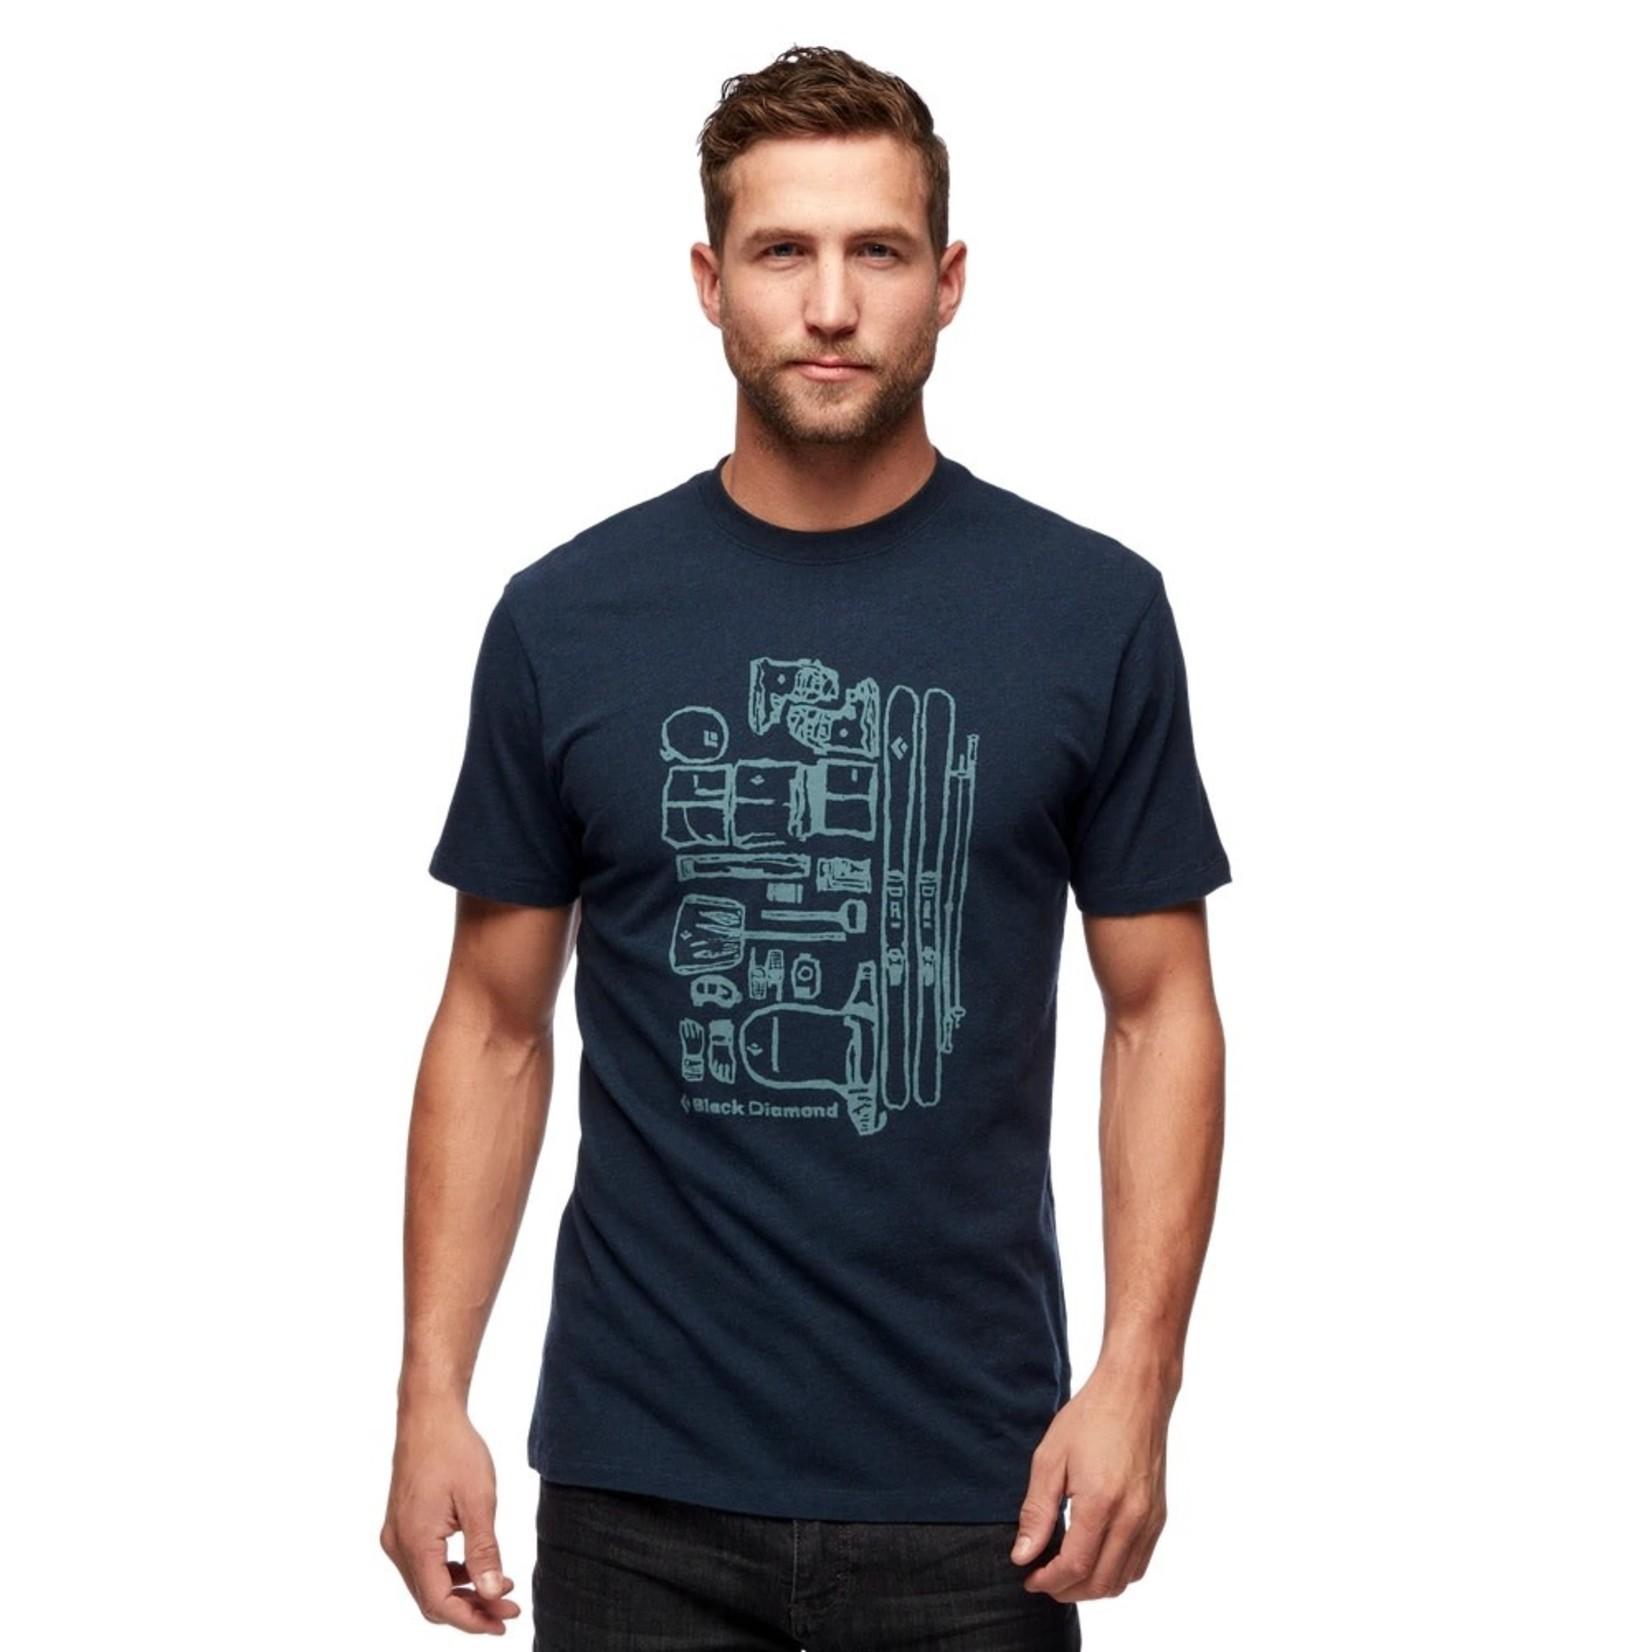 Black Diamond T-shirt Black Diamond Ski Gear - Homme